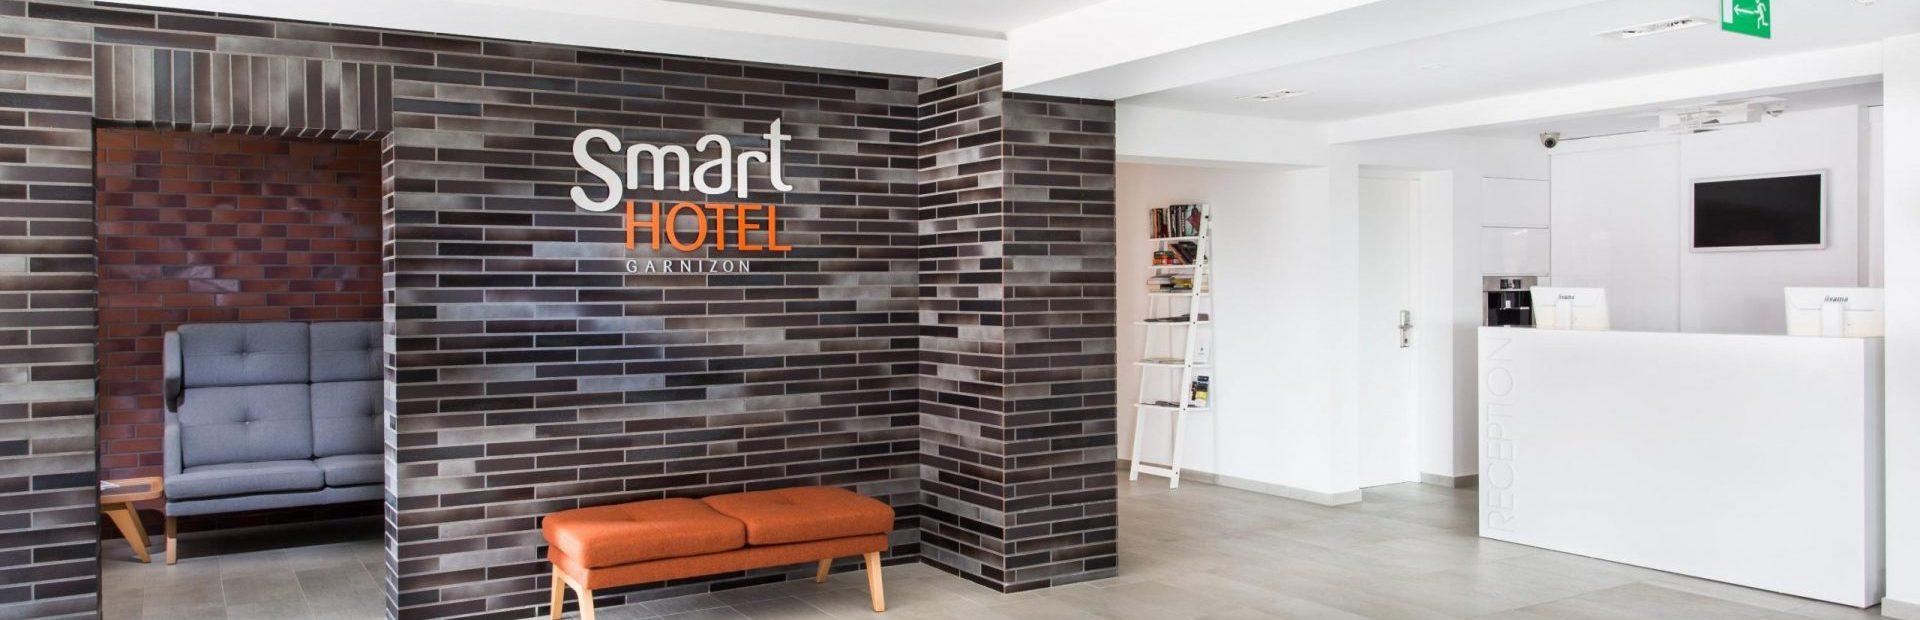 Hotel Smart Garnizon